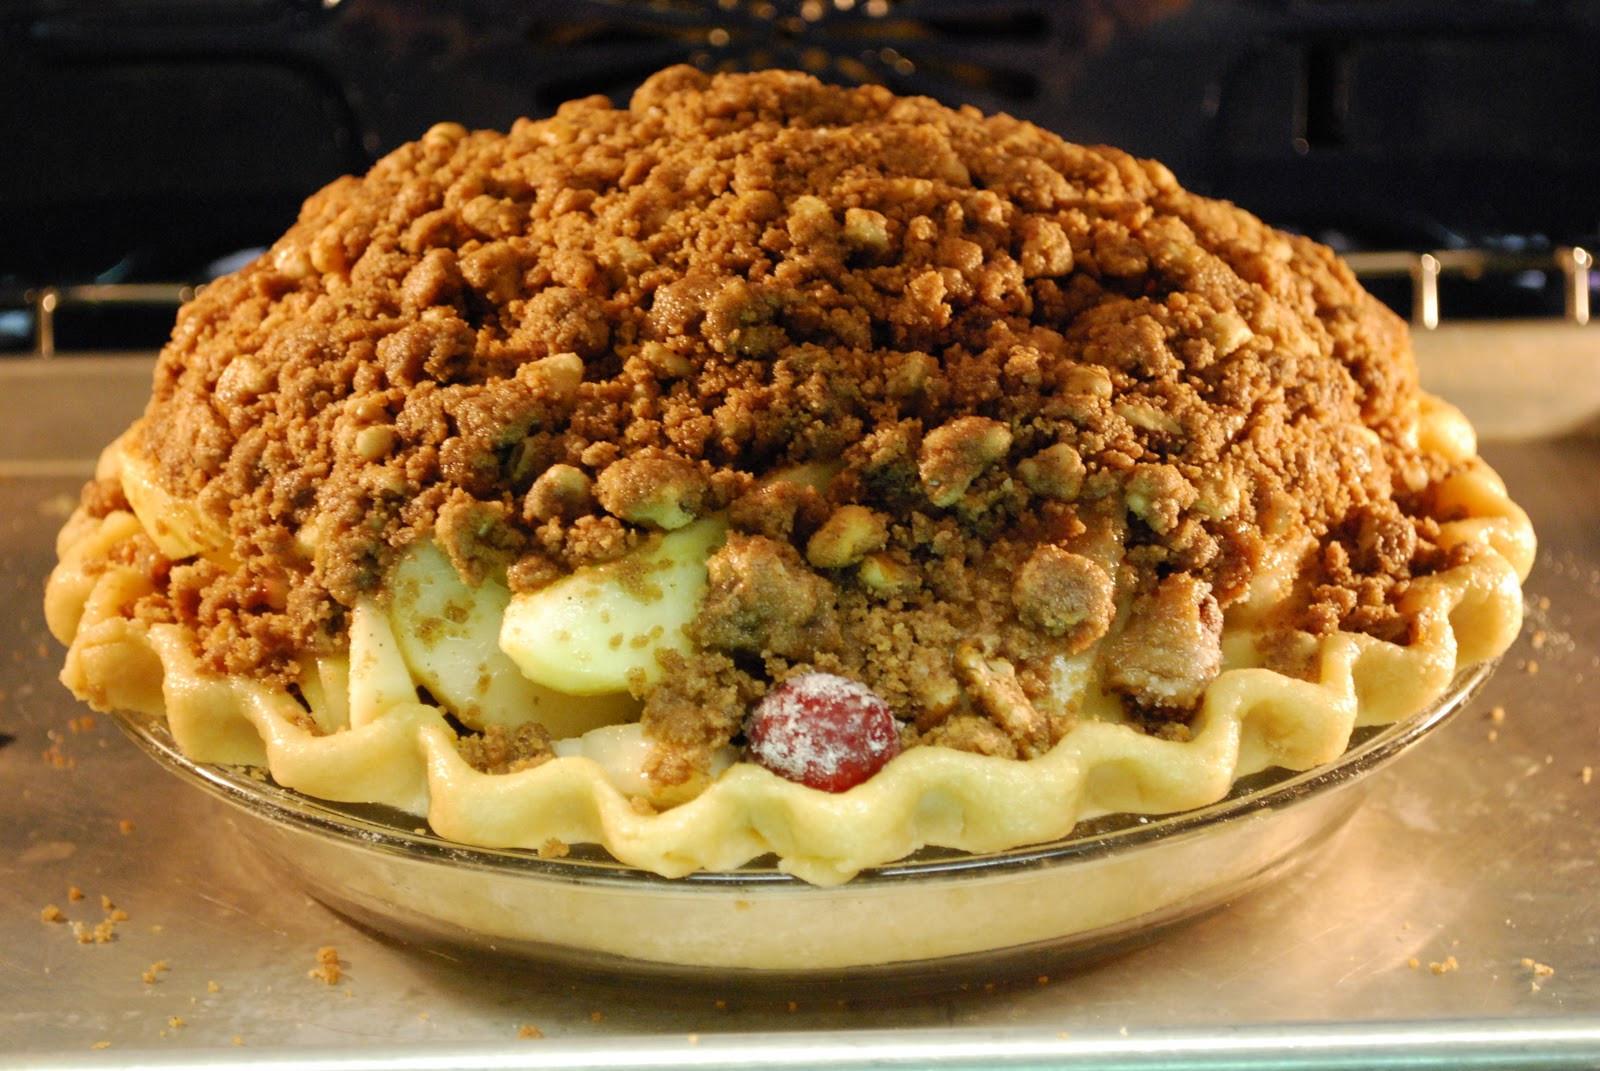 Winter Pie Recipes  Winter Apple And Dried Fruit Pie Recipe — Dishmaps